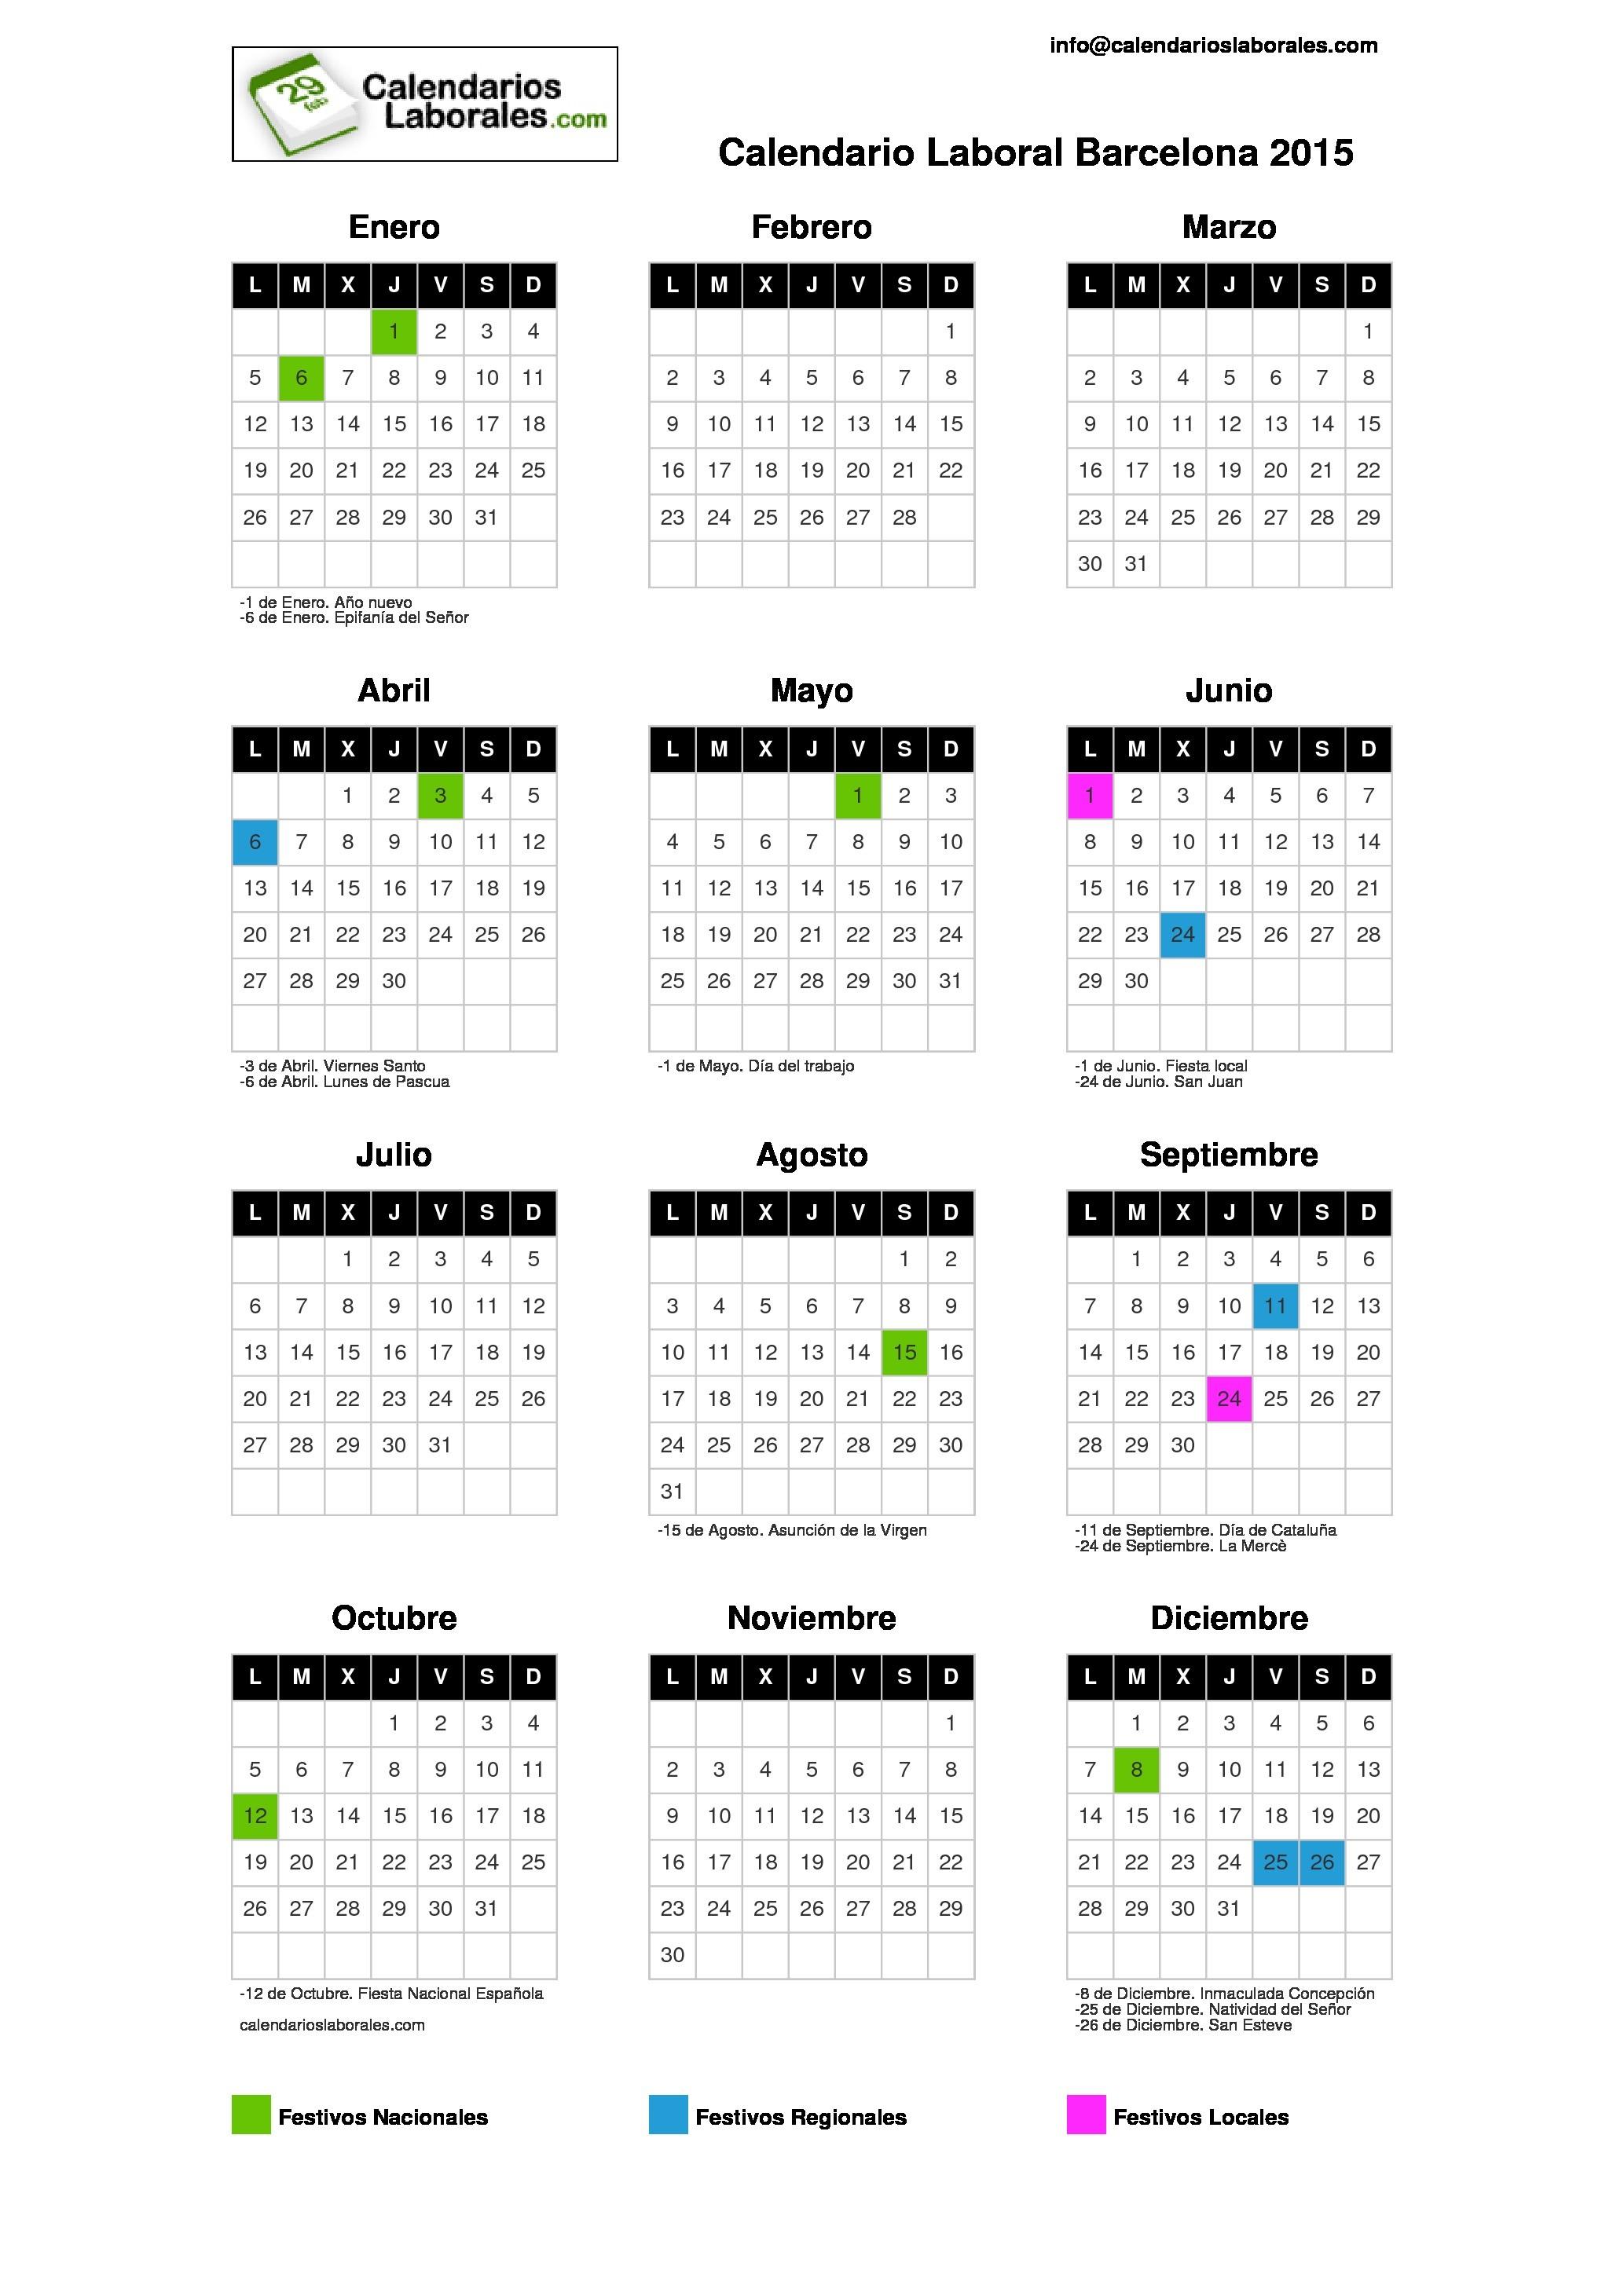 imagenes de calendario 2015 Haskatashort